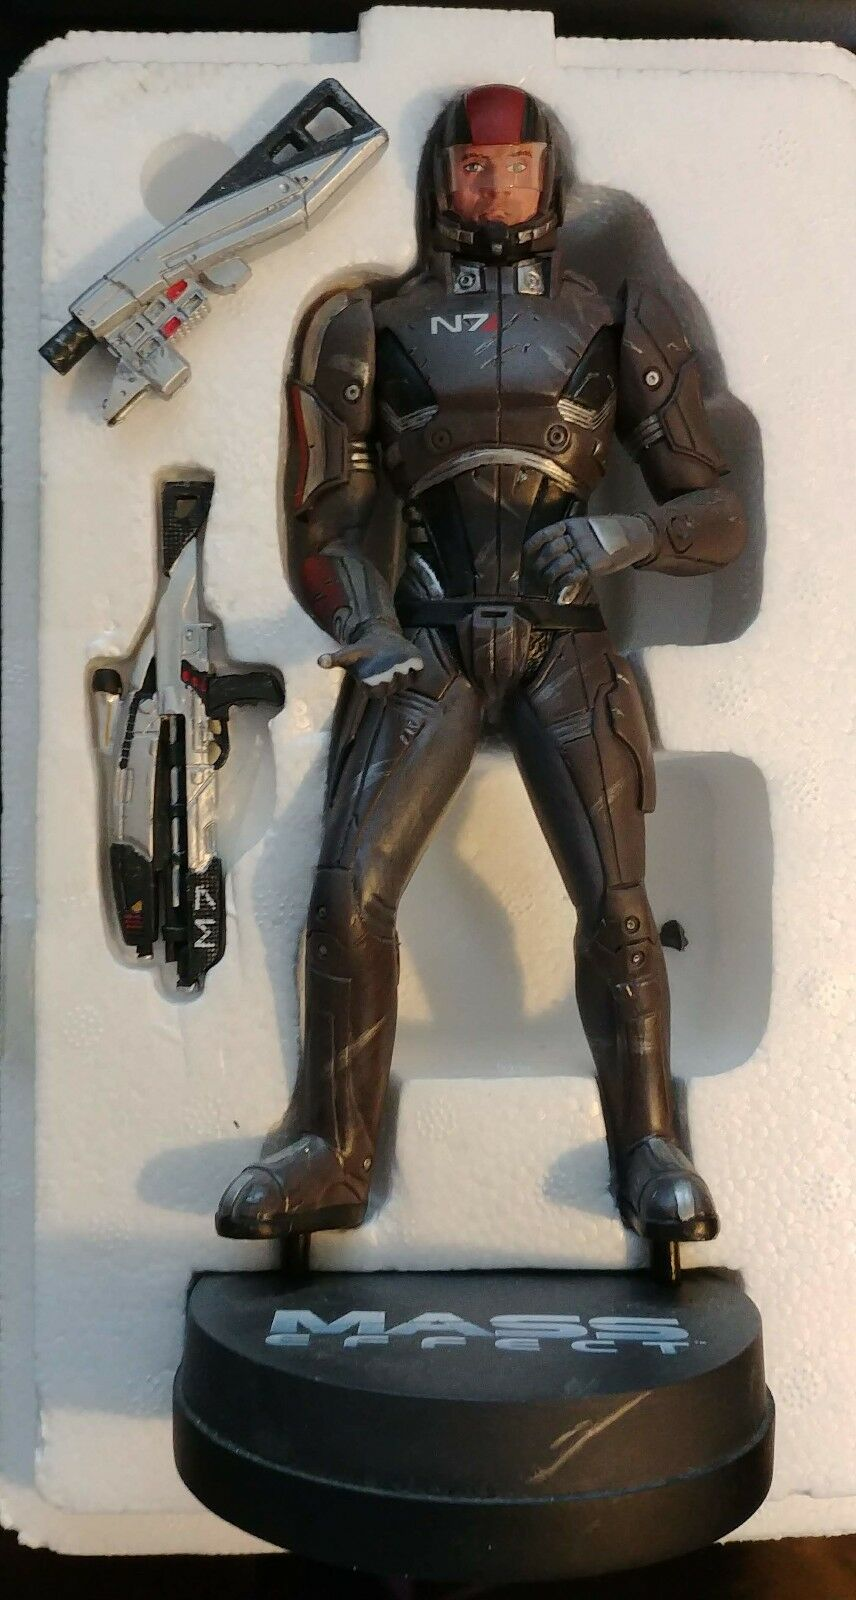 Commander Shepard Limited Edition Polyresin Statue - slight damage, damaged box